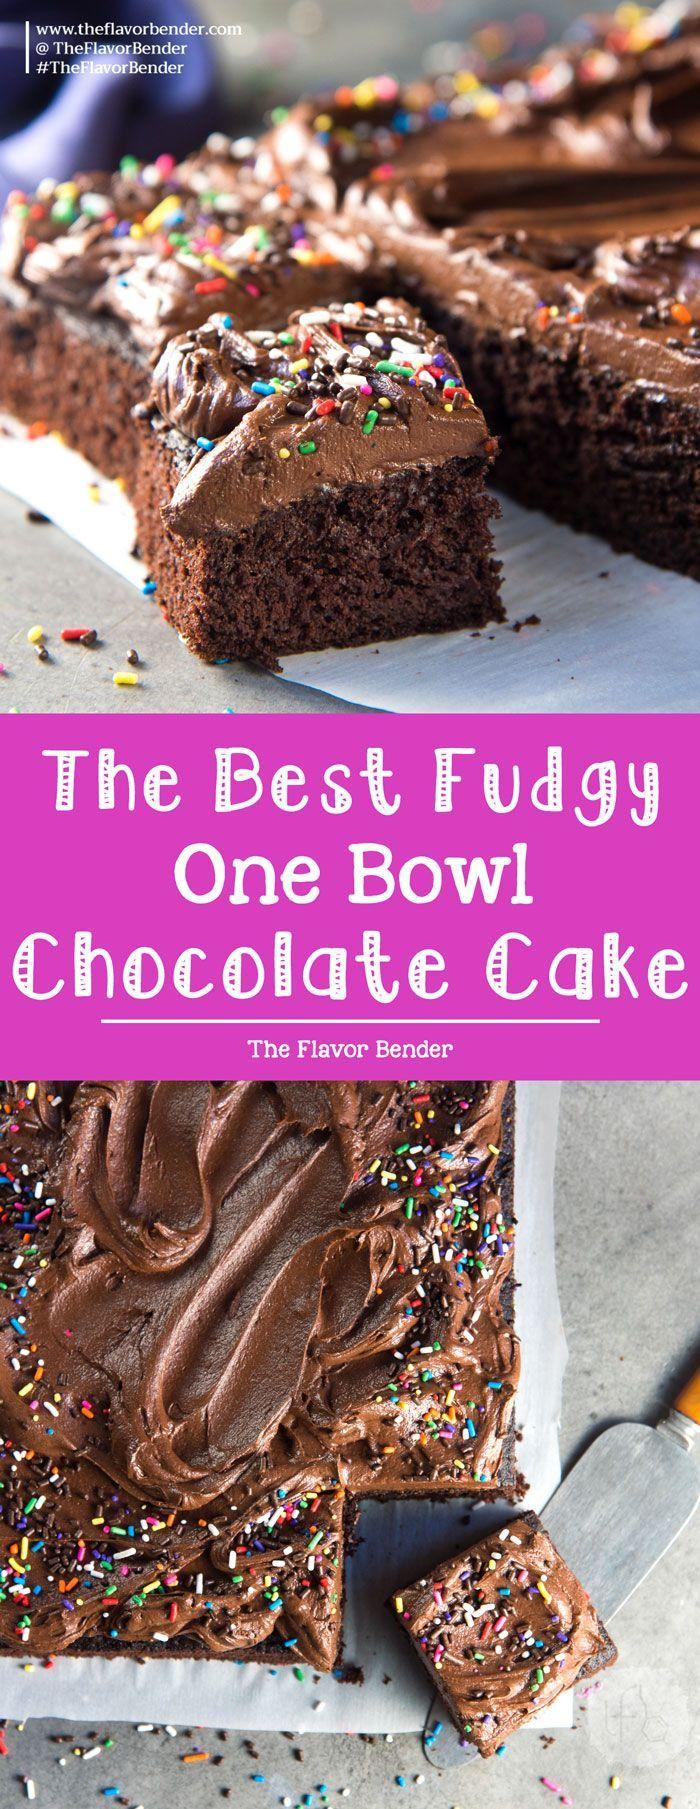 53 best The Best Cake Recipes Blog images on Pinterest   Apple cake ...